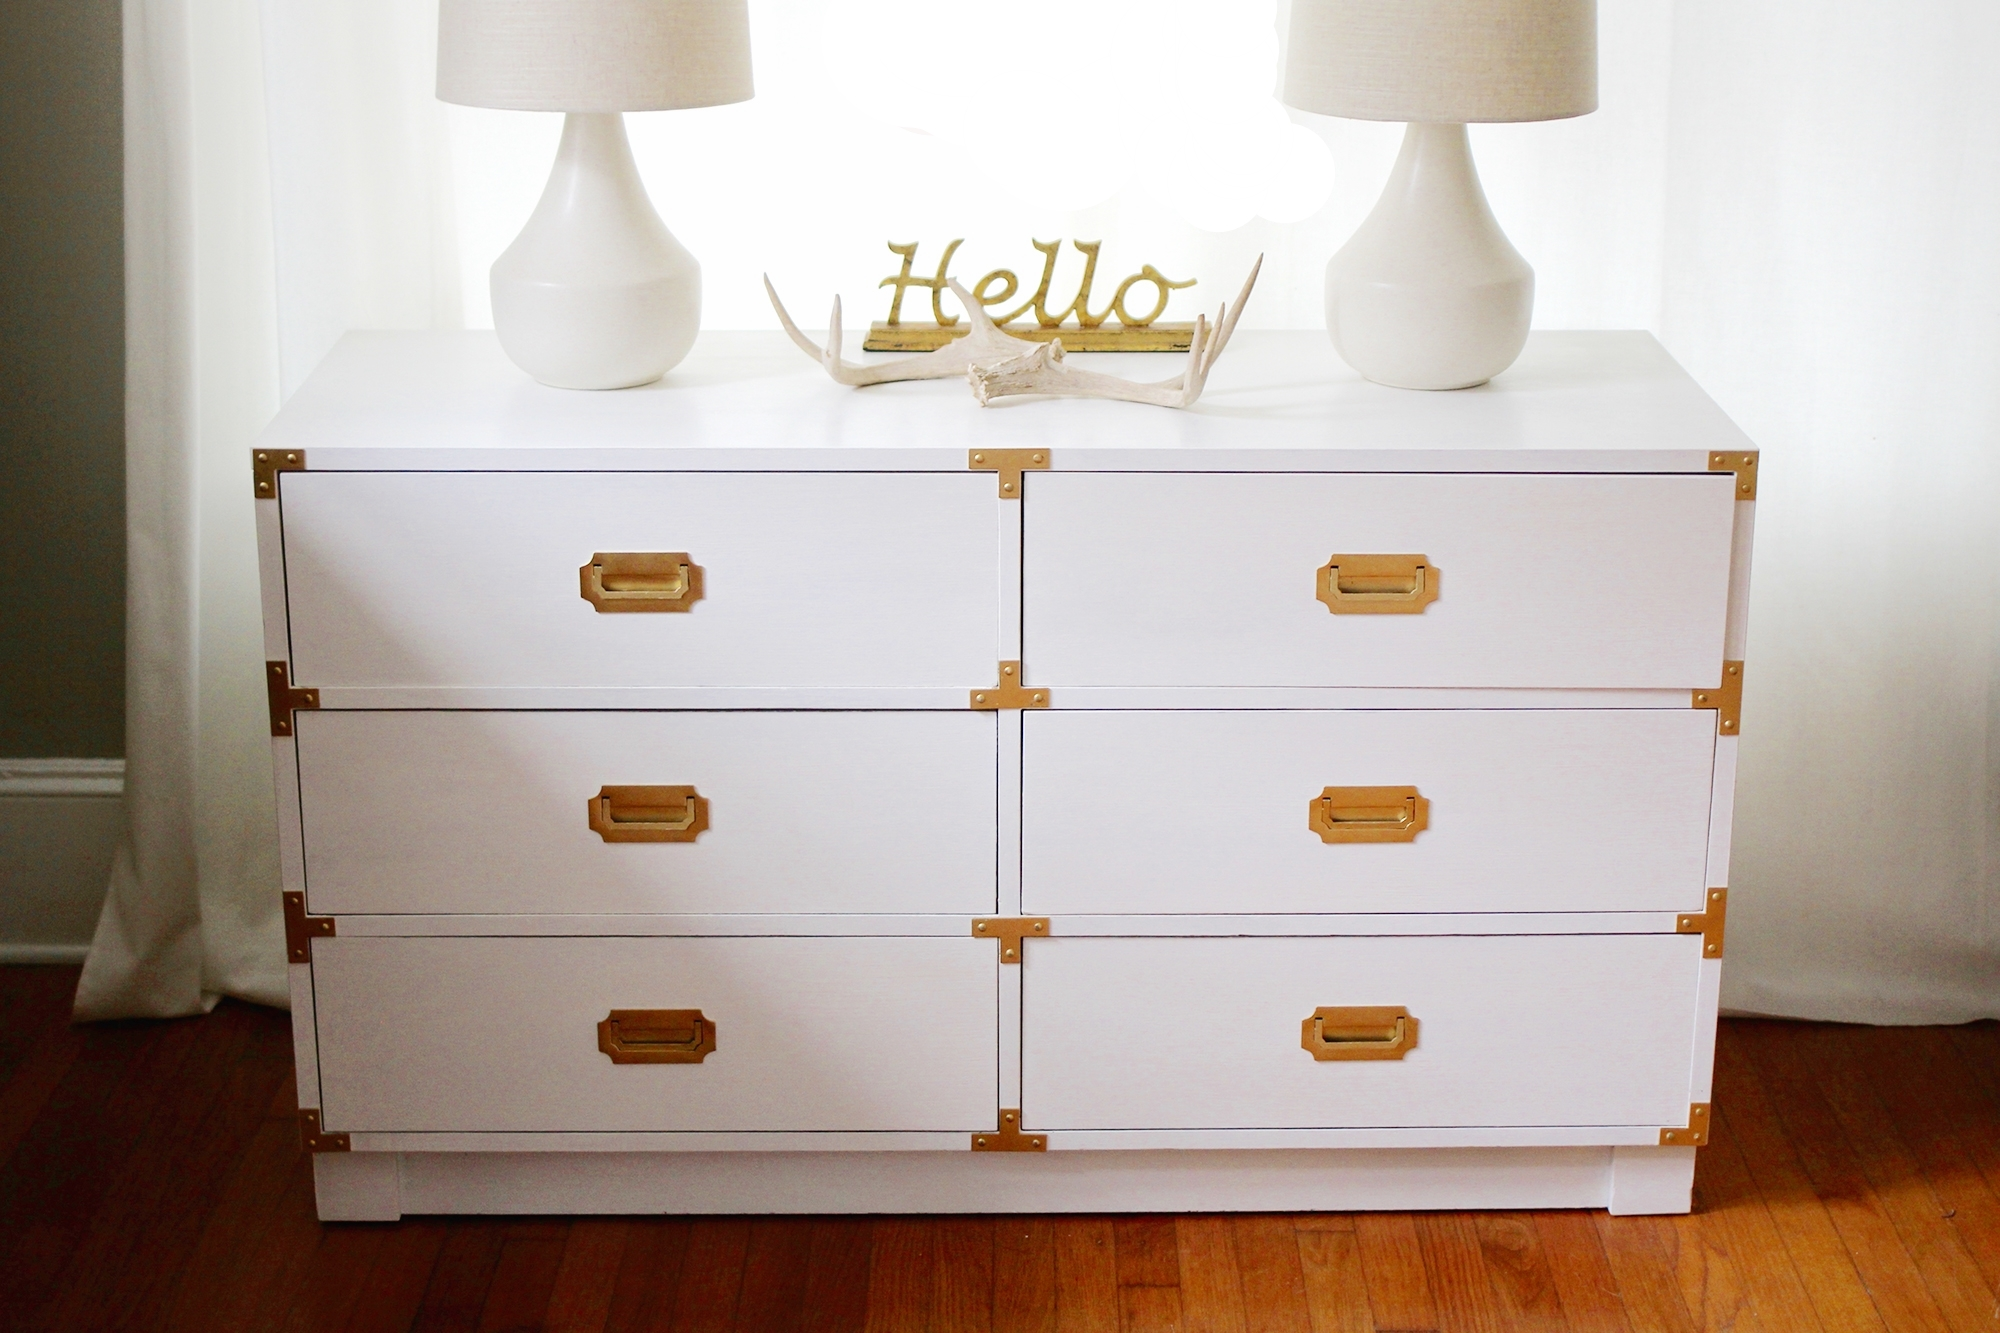 jo-torrijos-a-simpler-design-atlanta-interior-design-campaign-dresser-annie-sloan-pure-white-gold-8.jpg